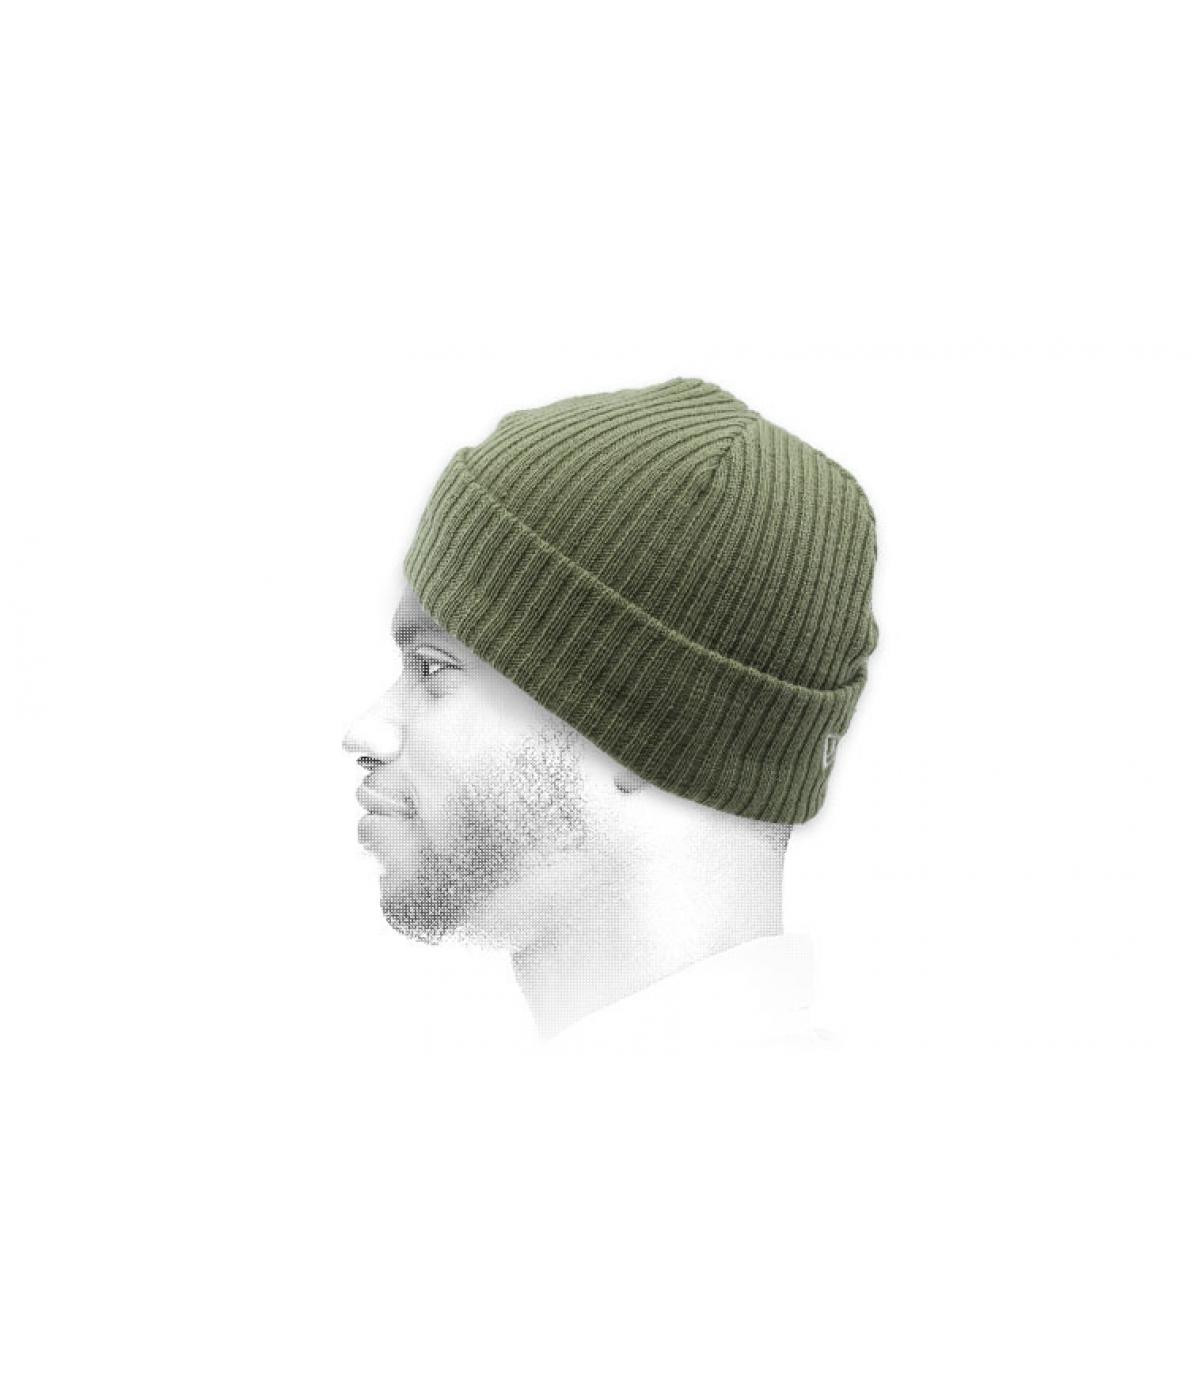 Mütze docker olivgrün